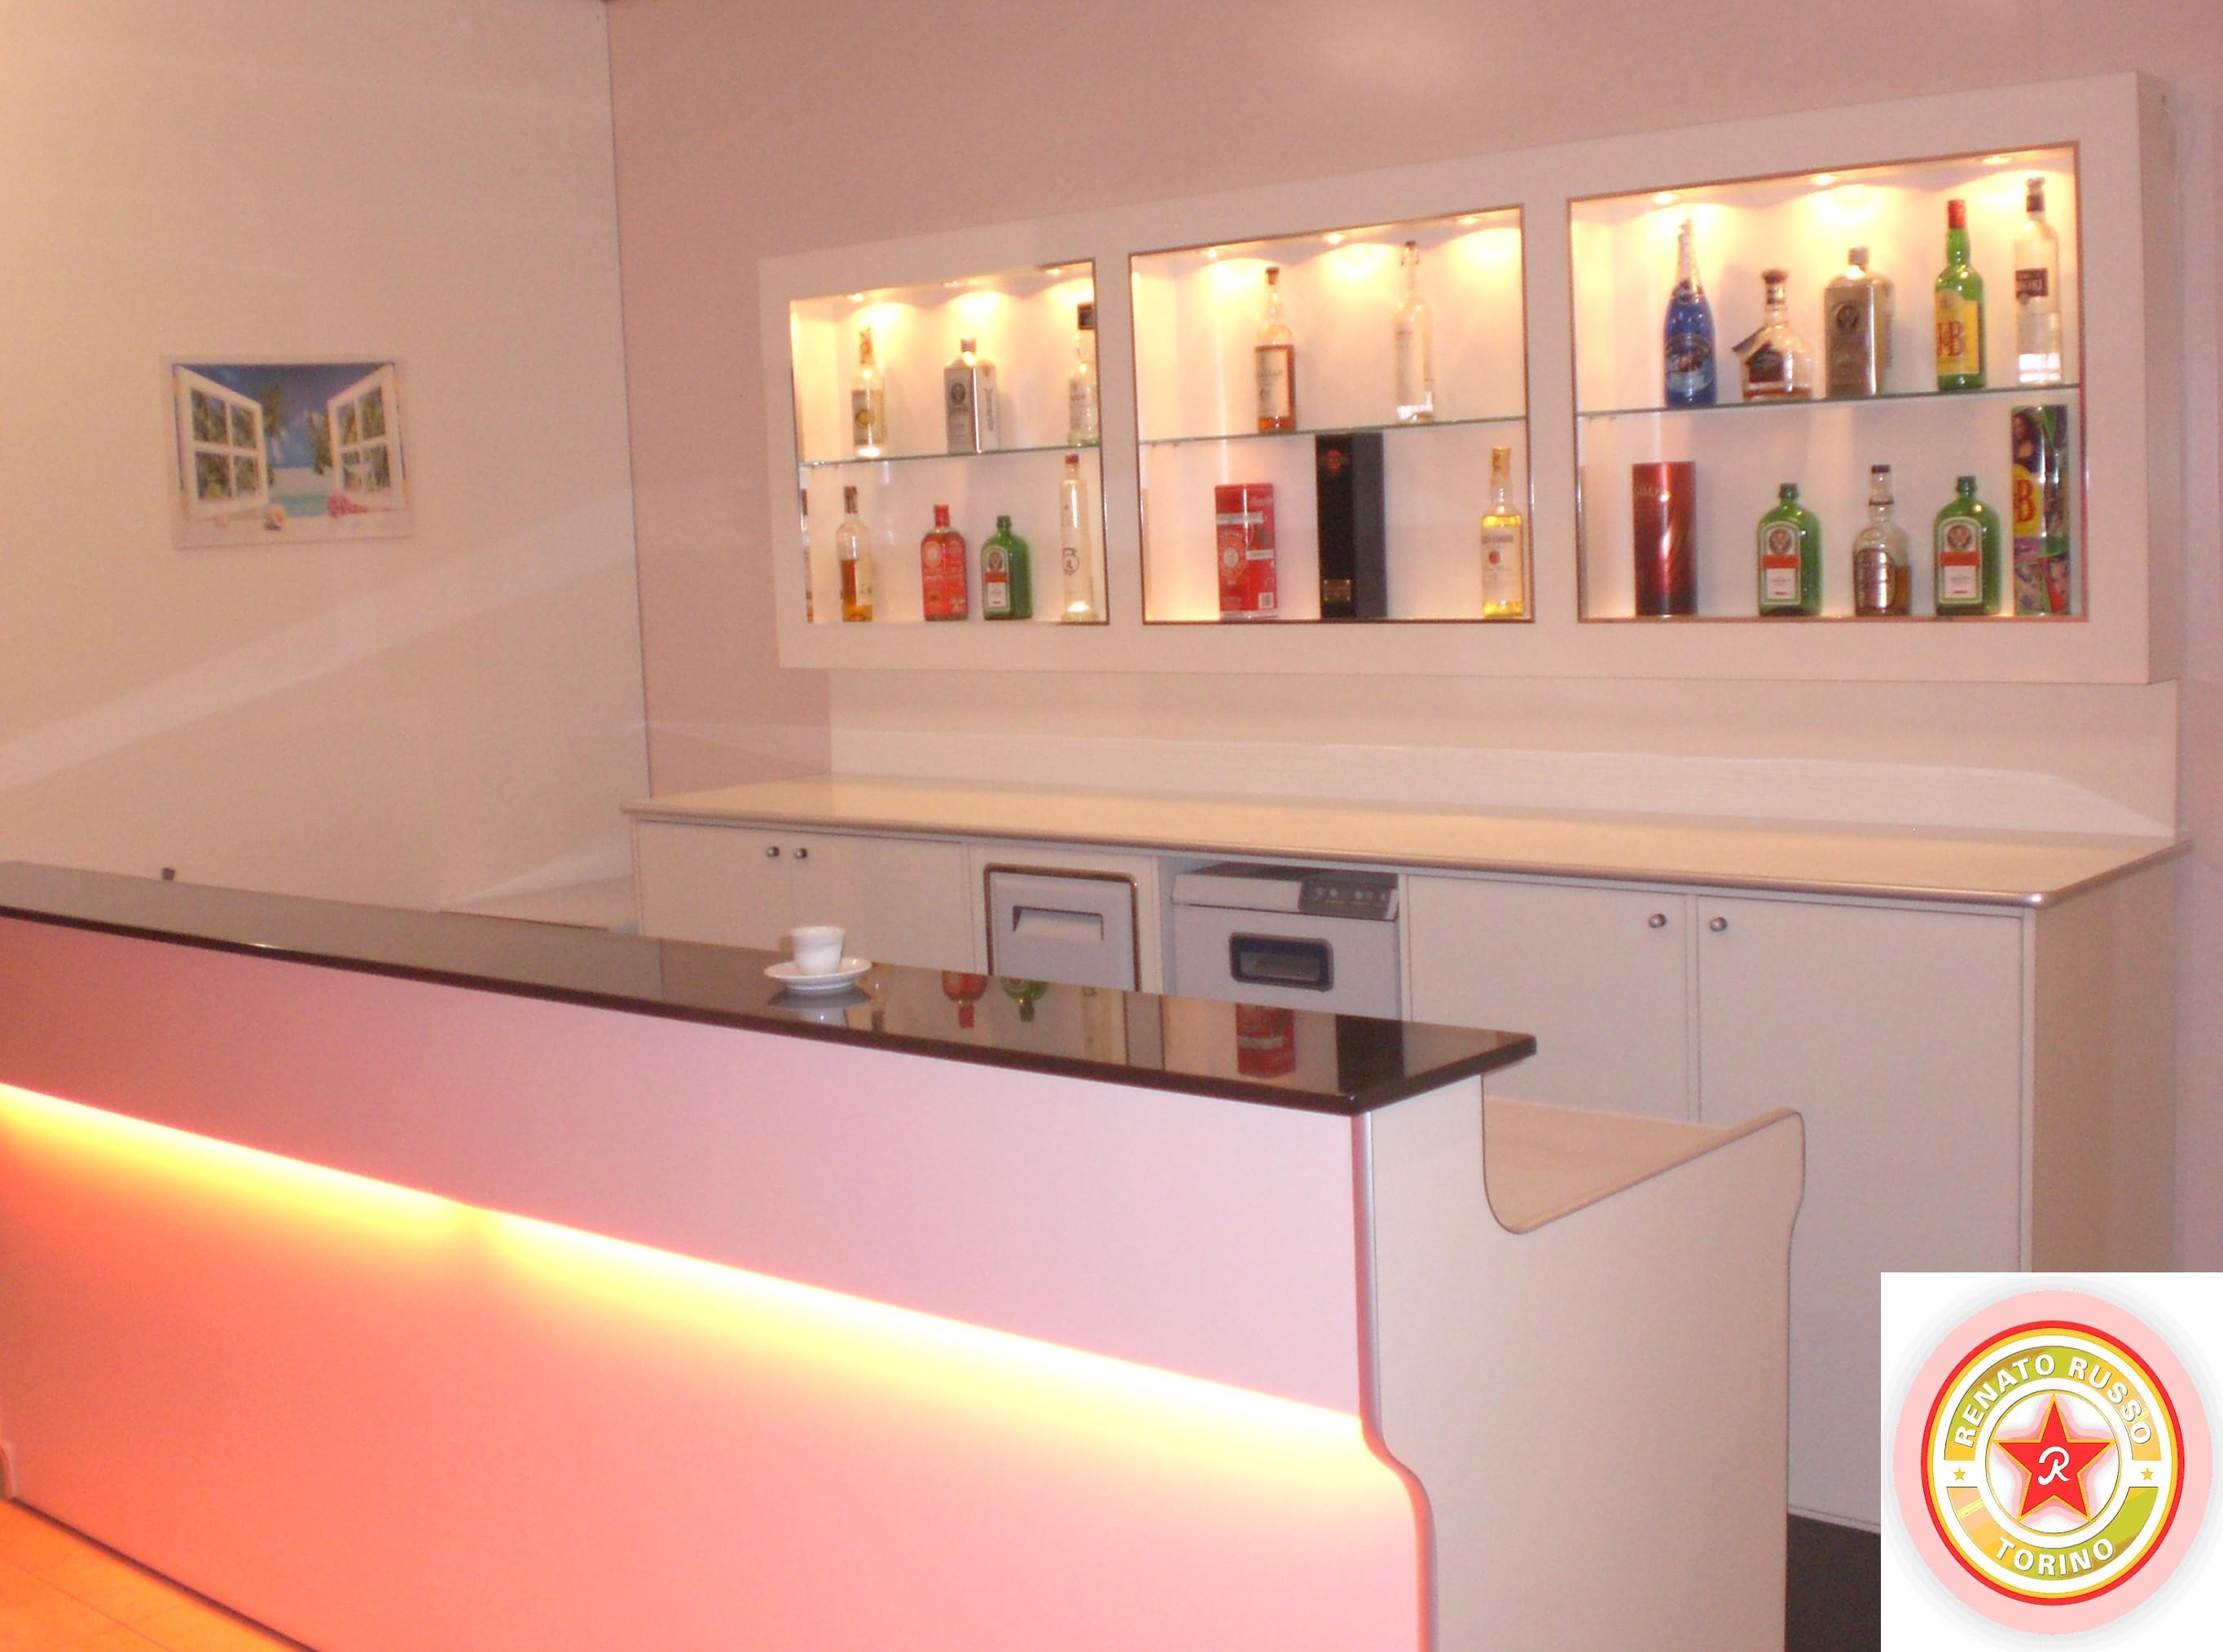 Fresco arredo bar casa design idee su arredamento